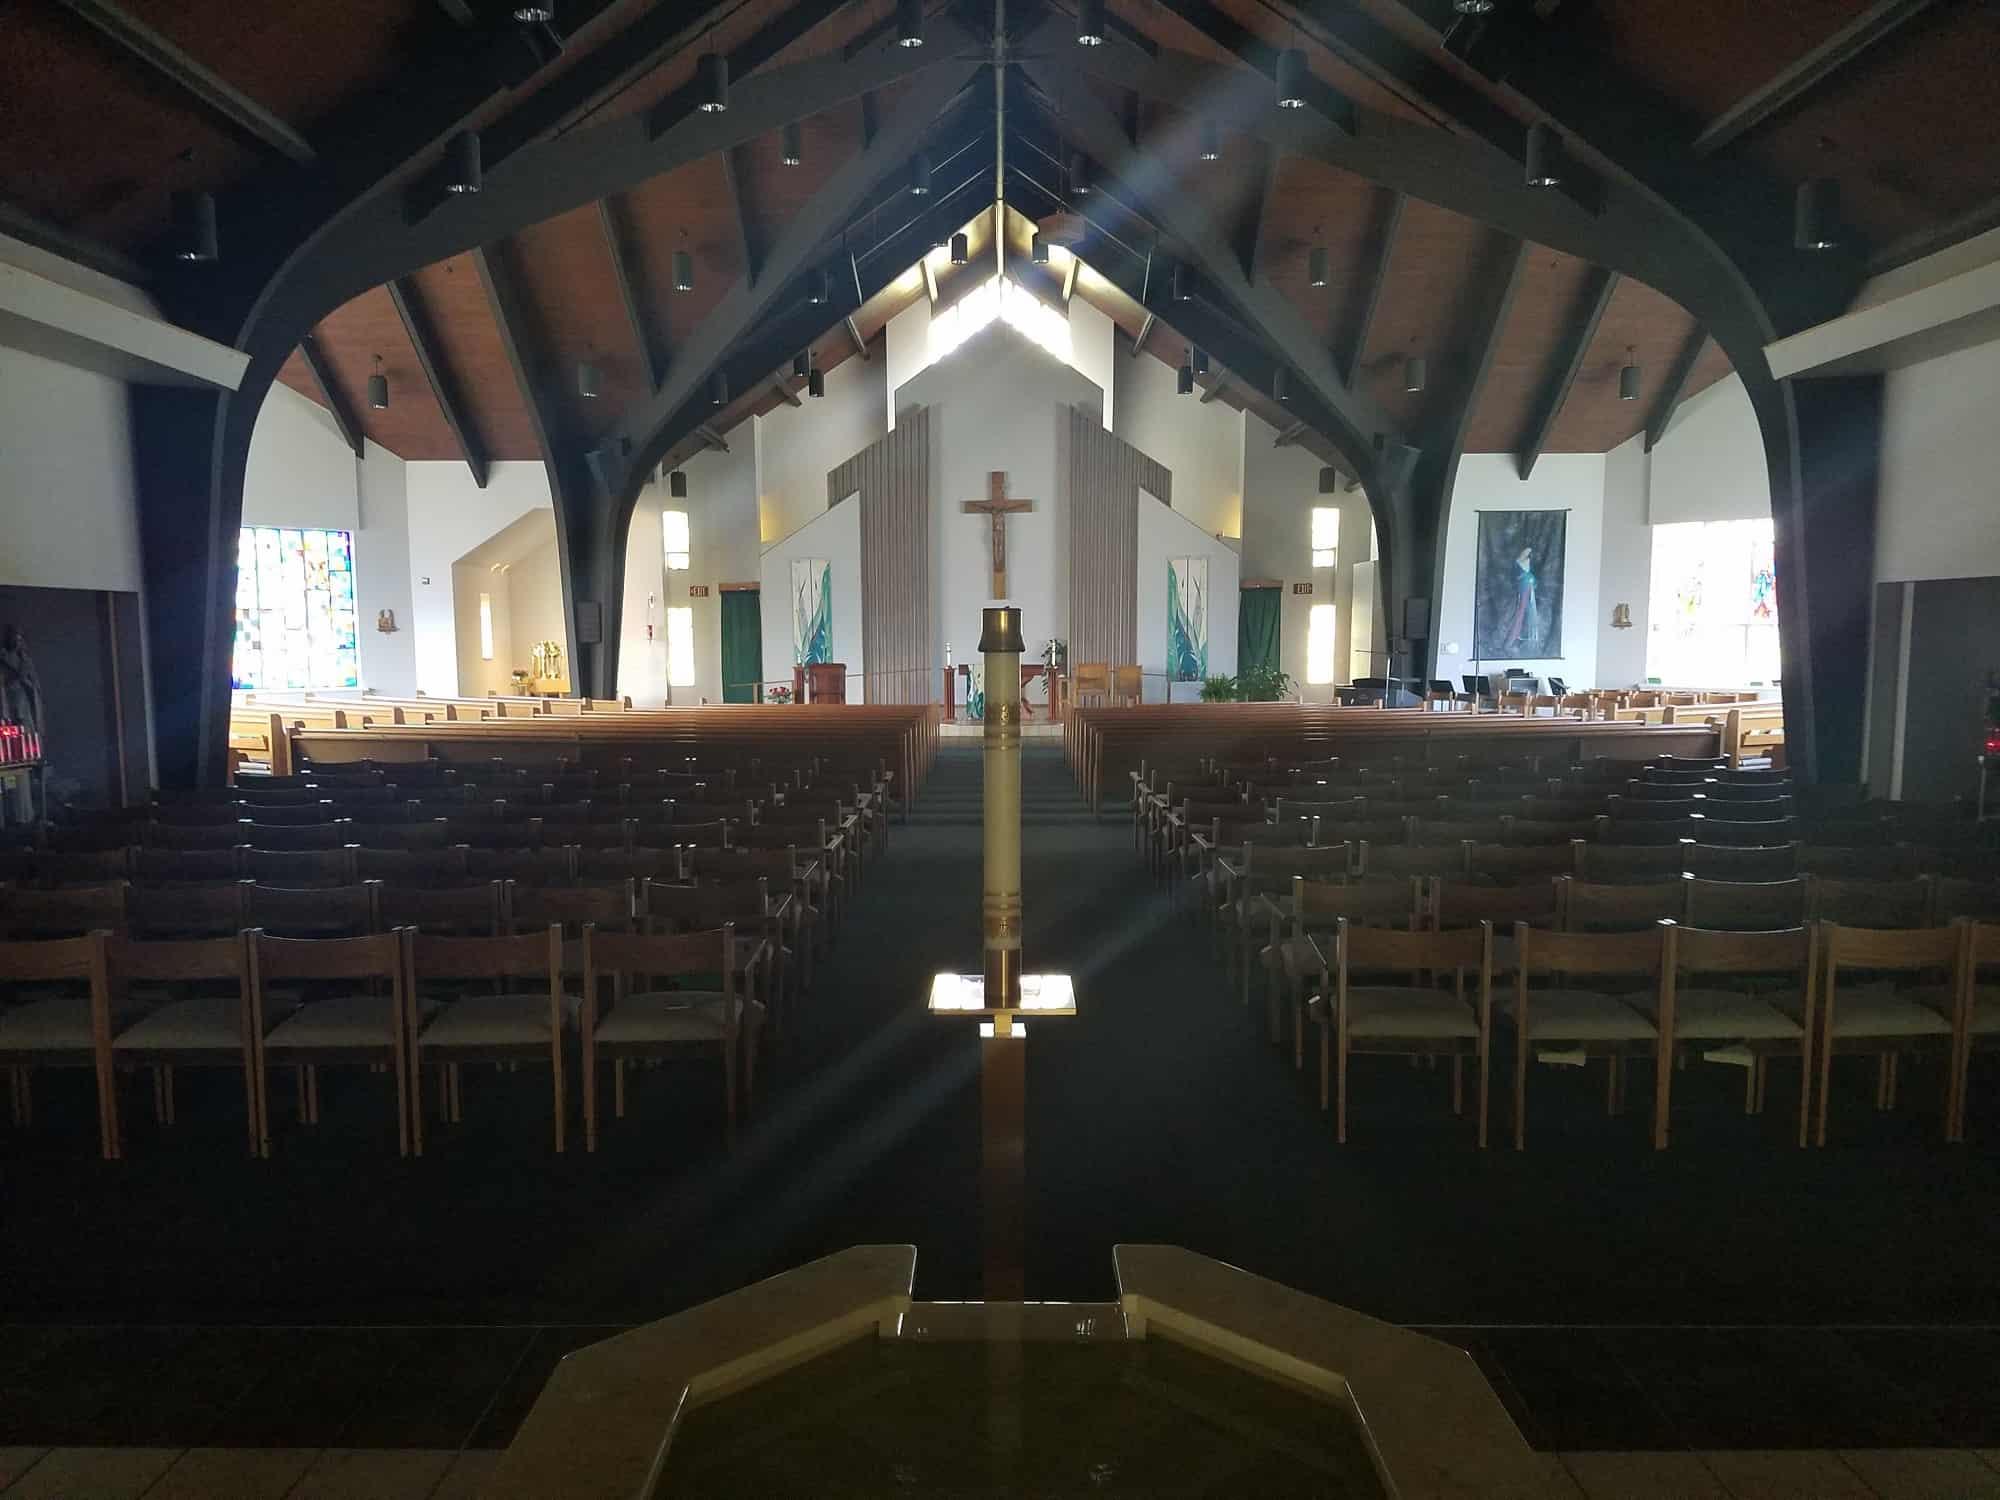 Our Parish Church – Holy Family